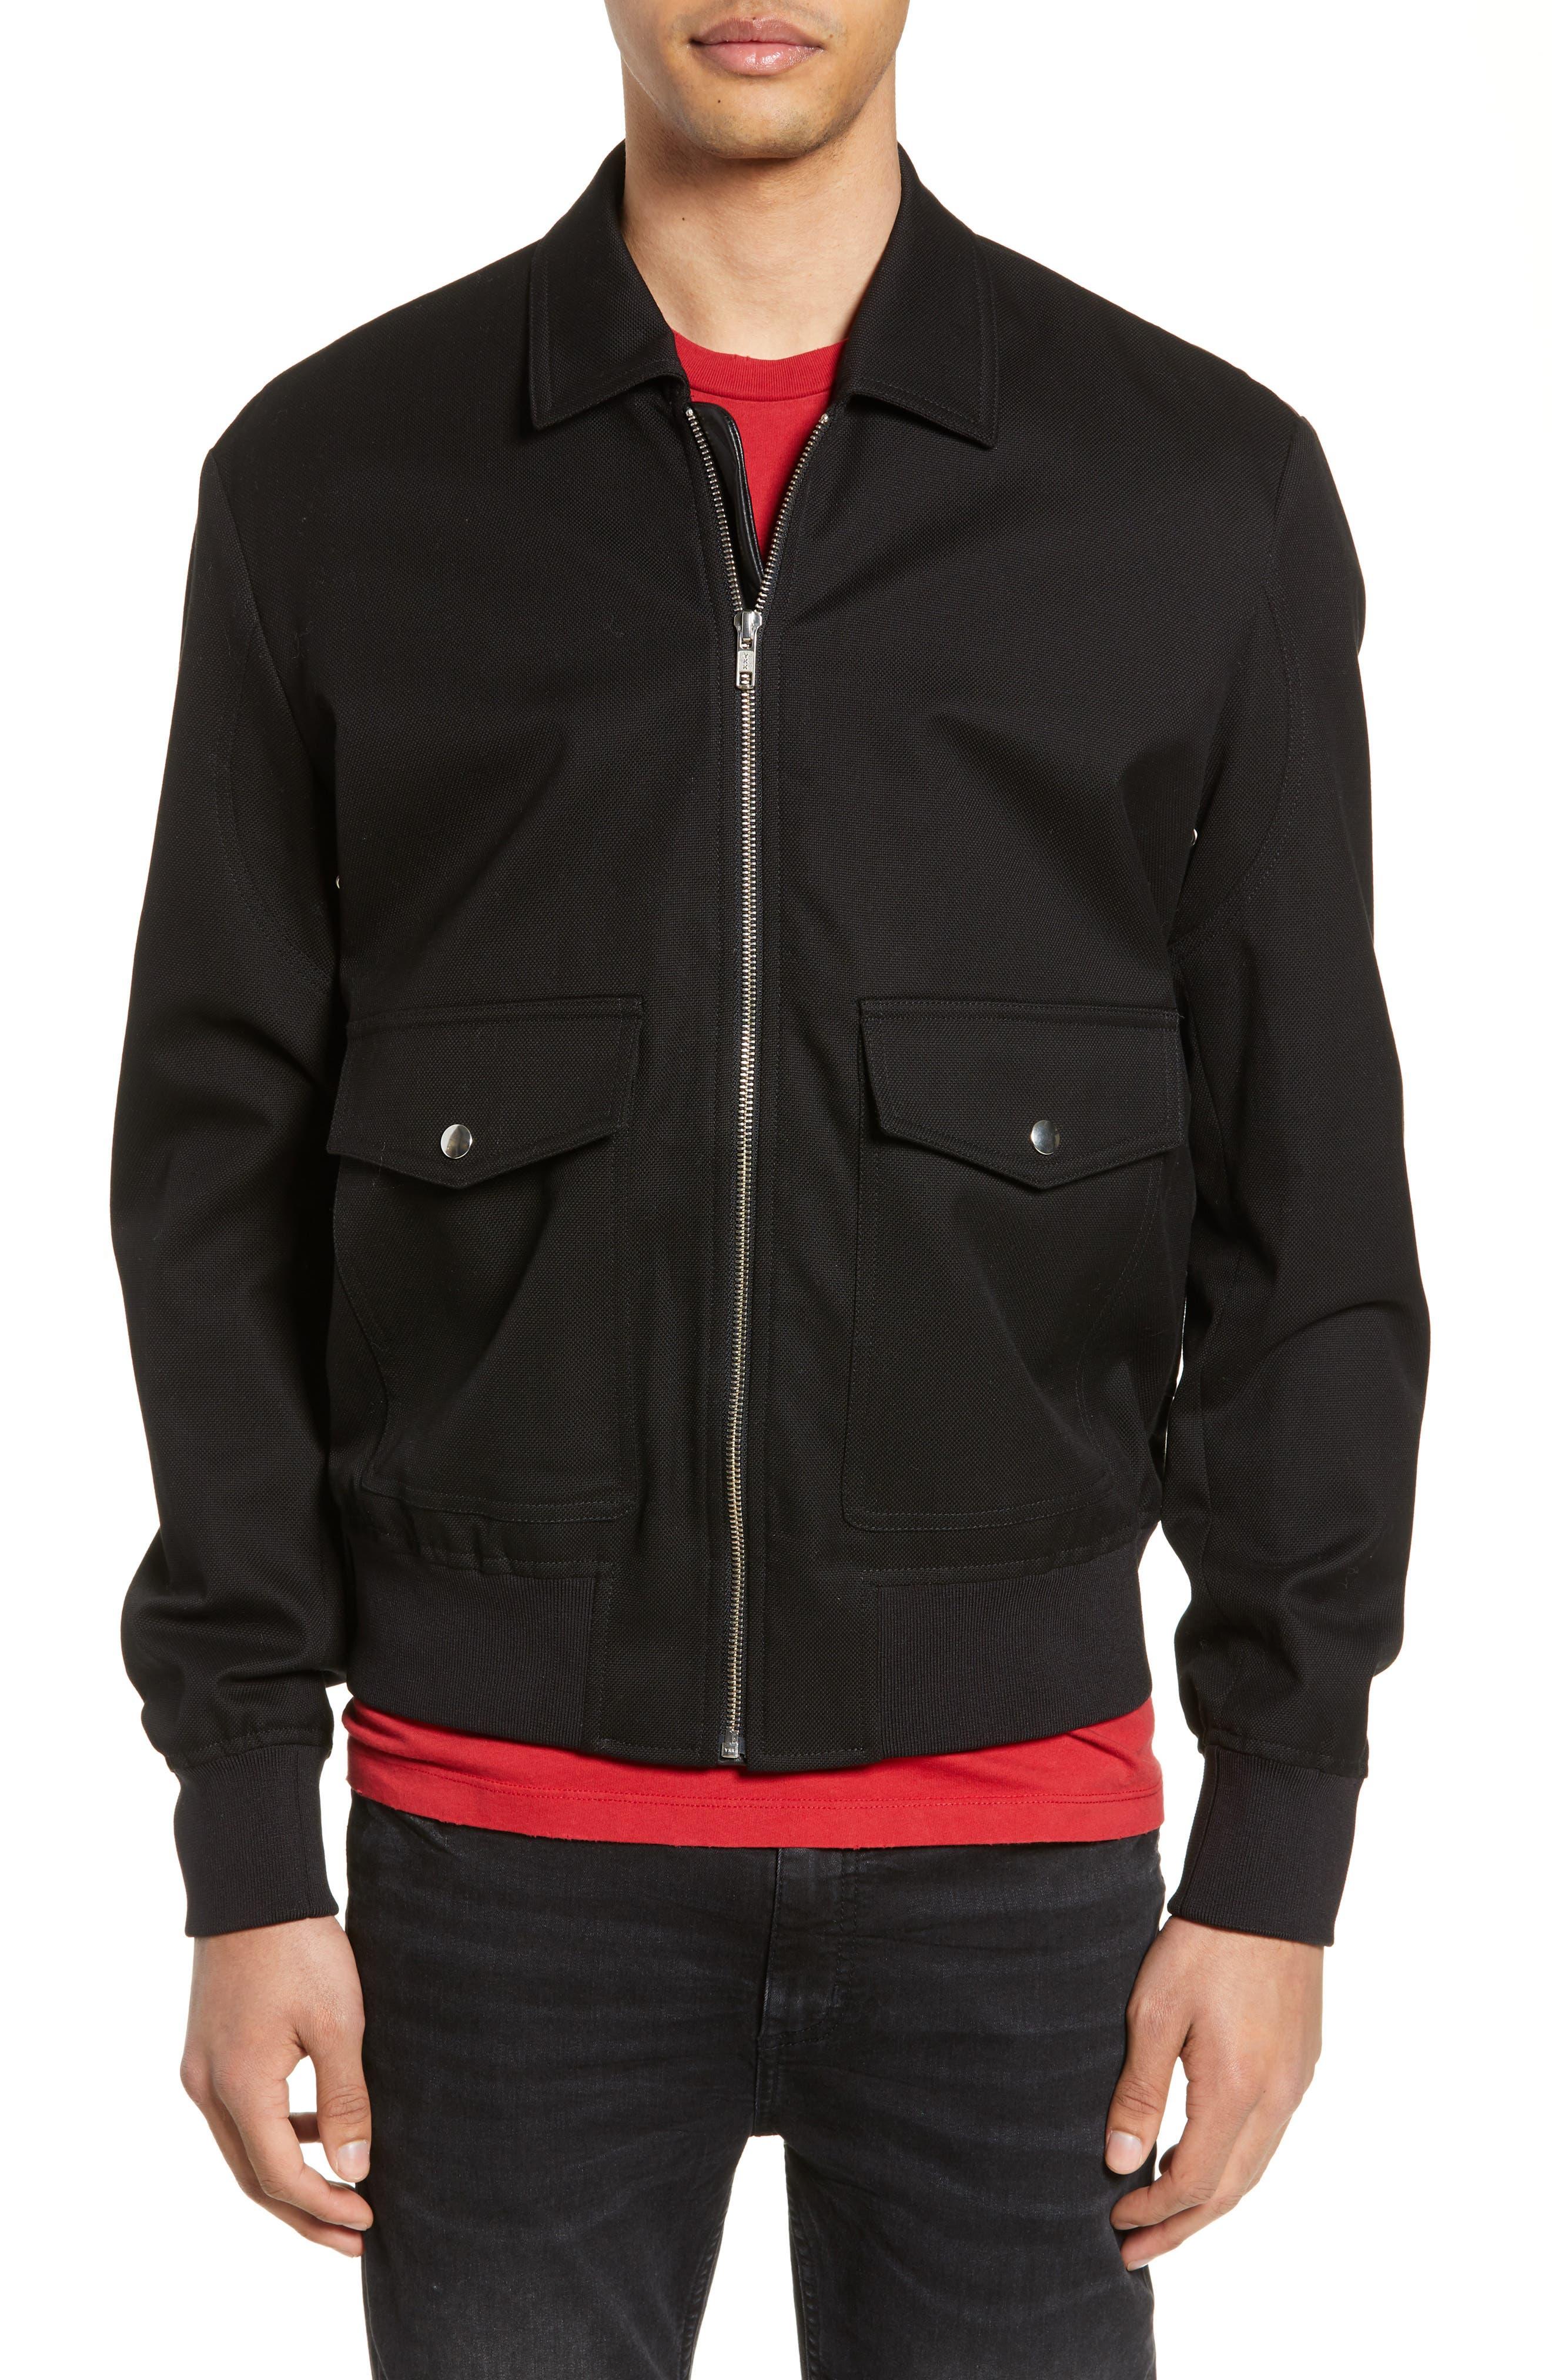 THE KOOPLES, Leather Detail Jacket, Alternate thumbnail 4, color, BLACK